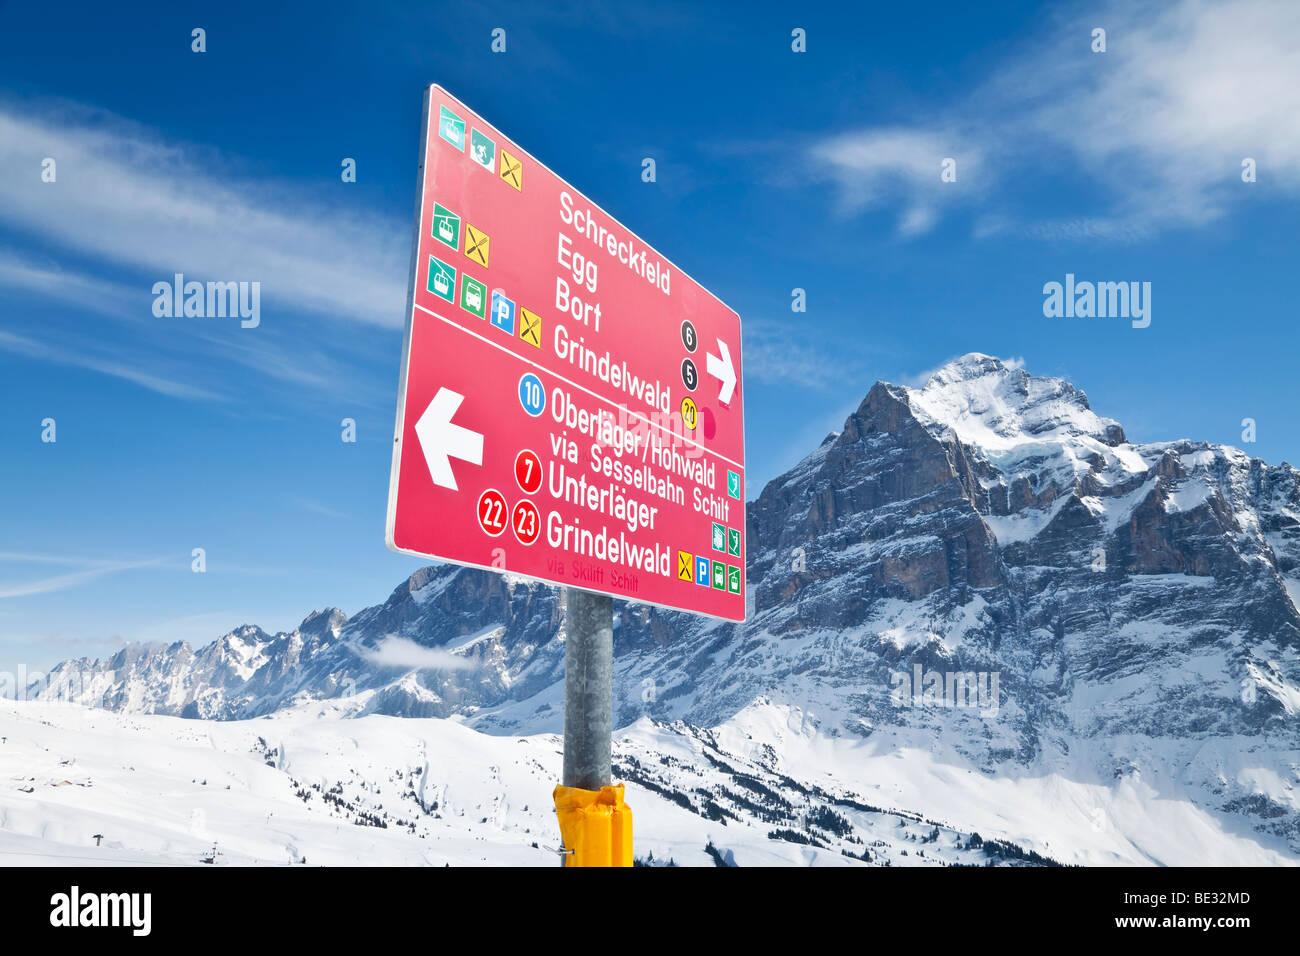 Signpost for skiers above Grindelwald, Jungfrau region, Bernese Oberland, Swiss Alps, Switzerland - Stock Image